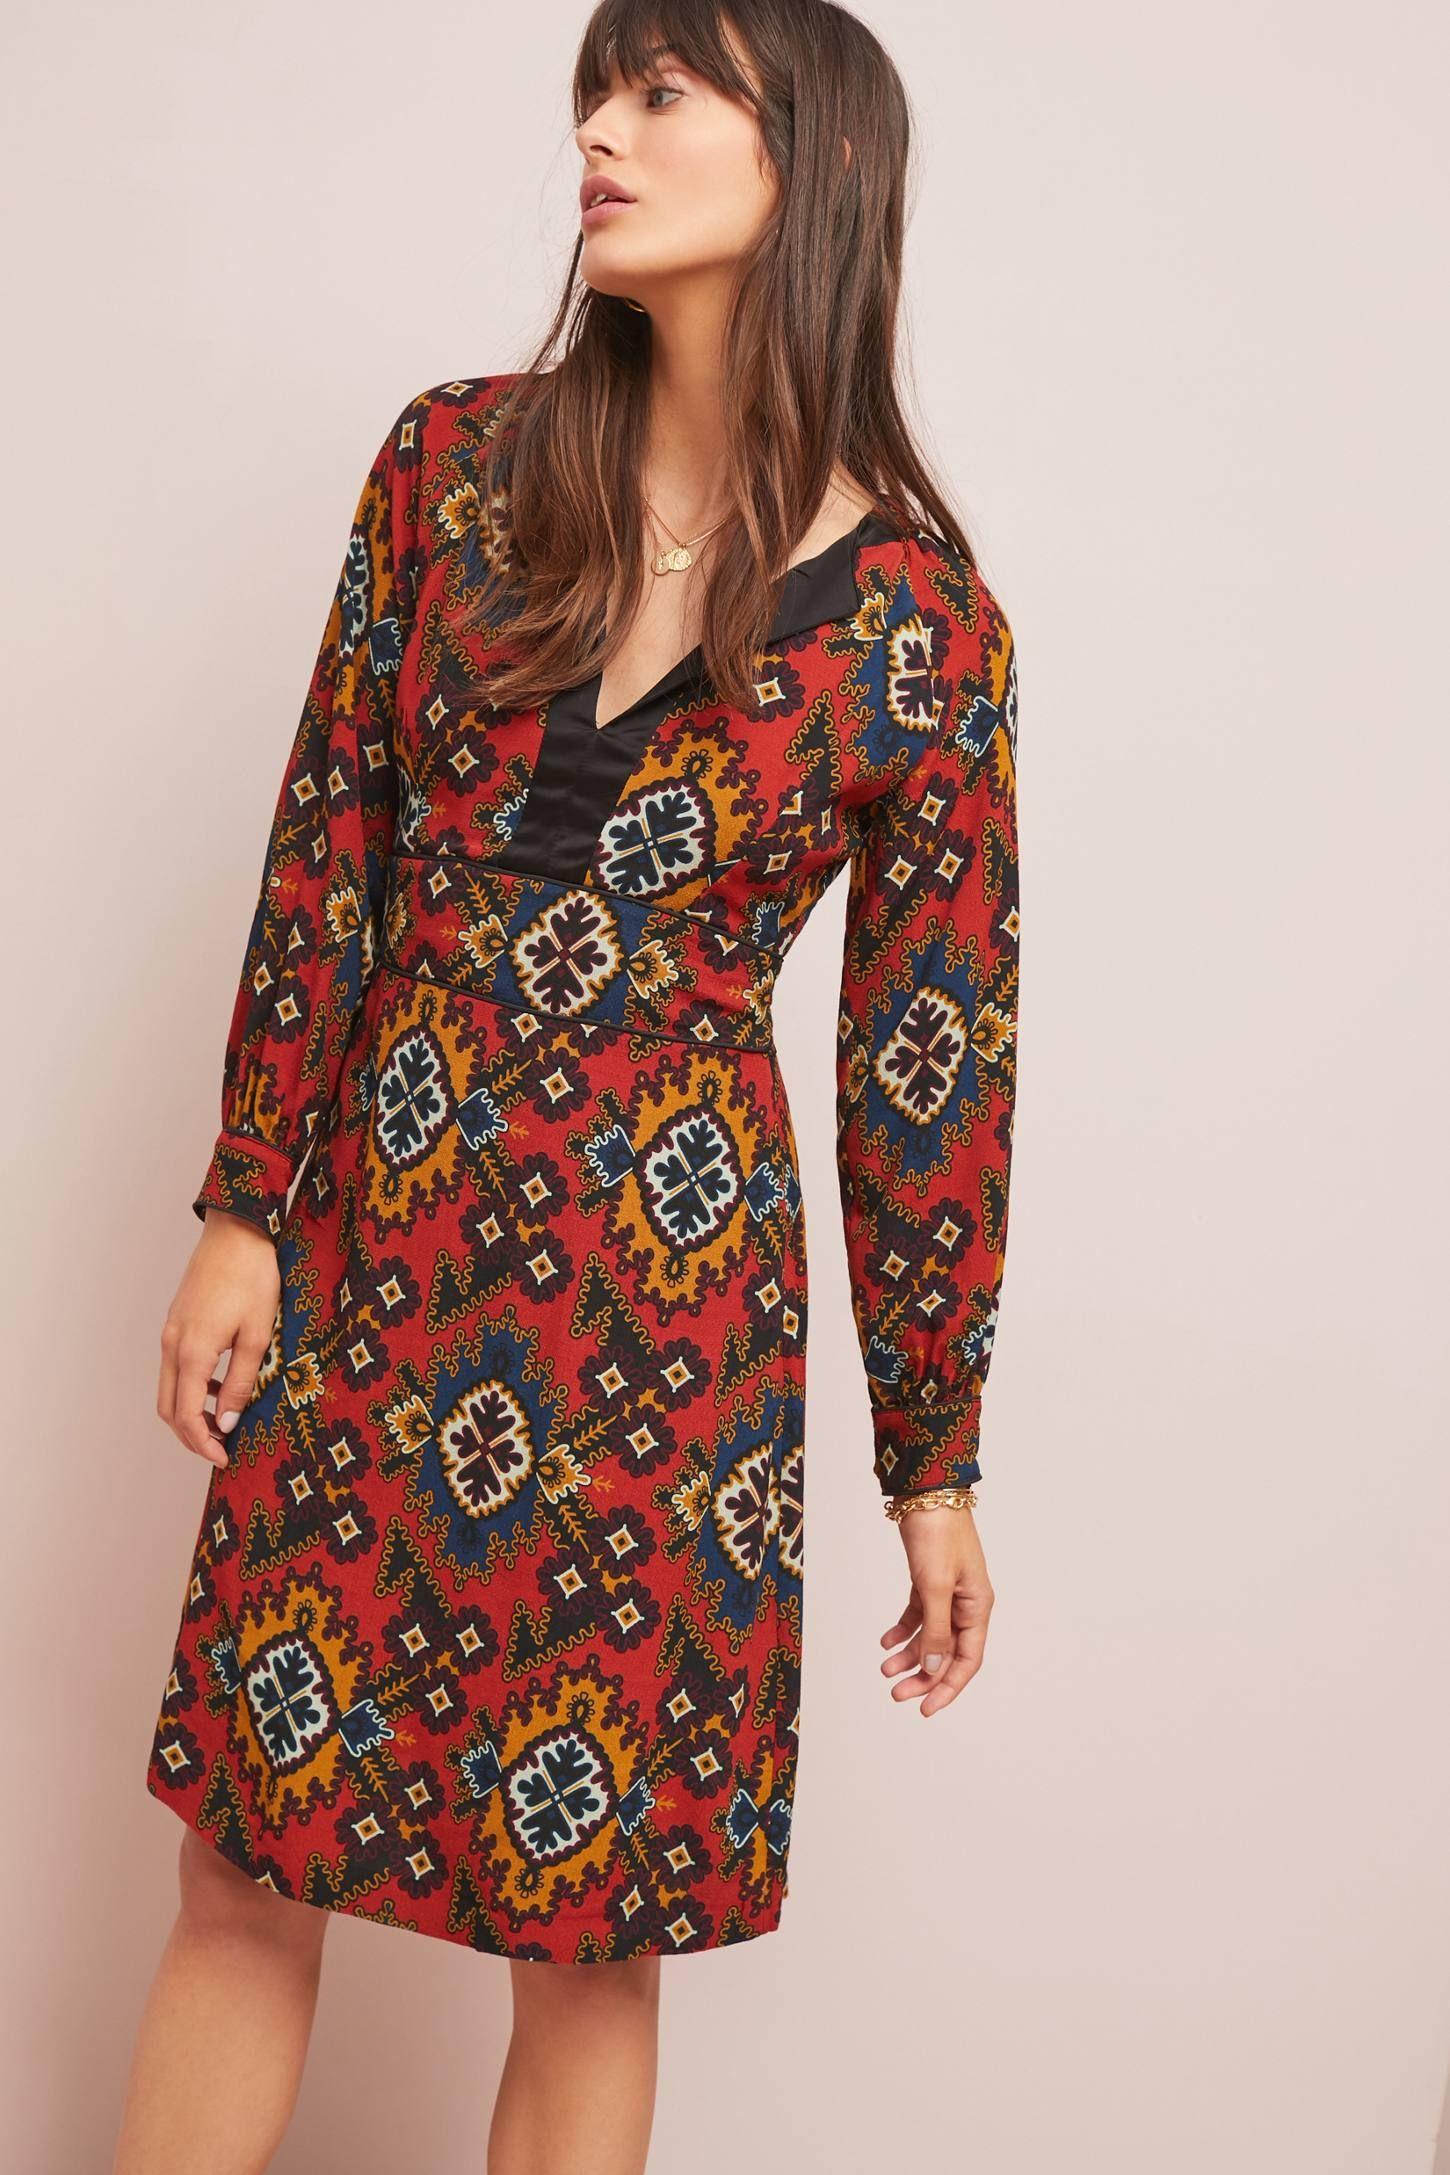 6298ddcb32c4 Illyrian Tunic Dress | Wish List | Dresses, Tunic, Clothes